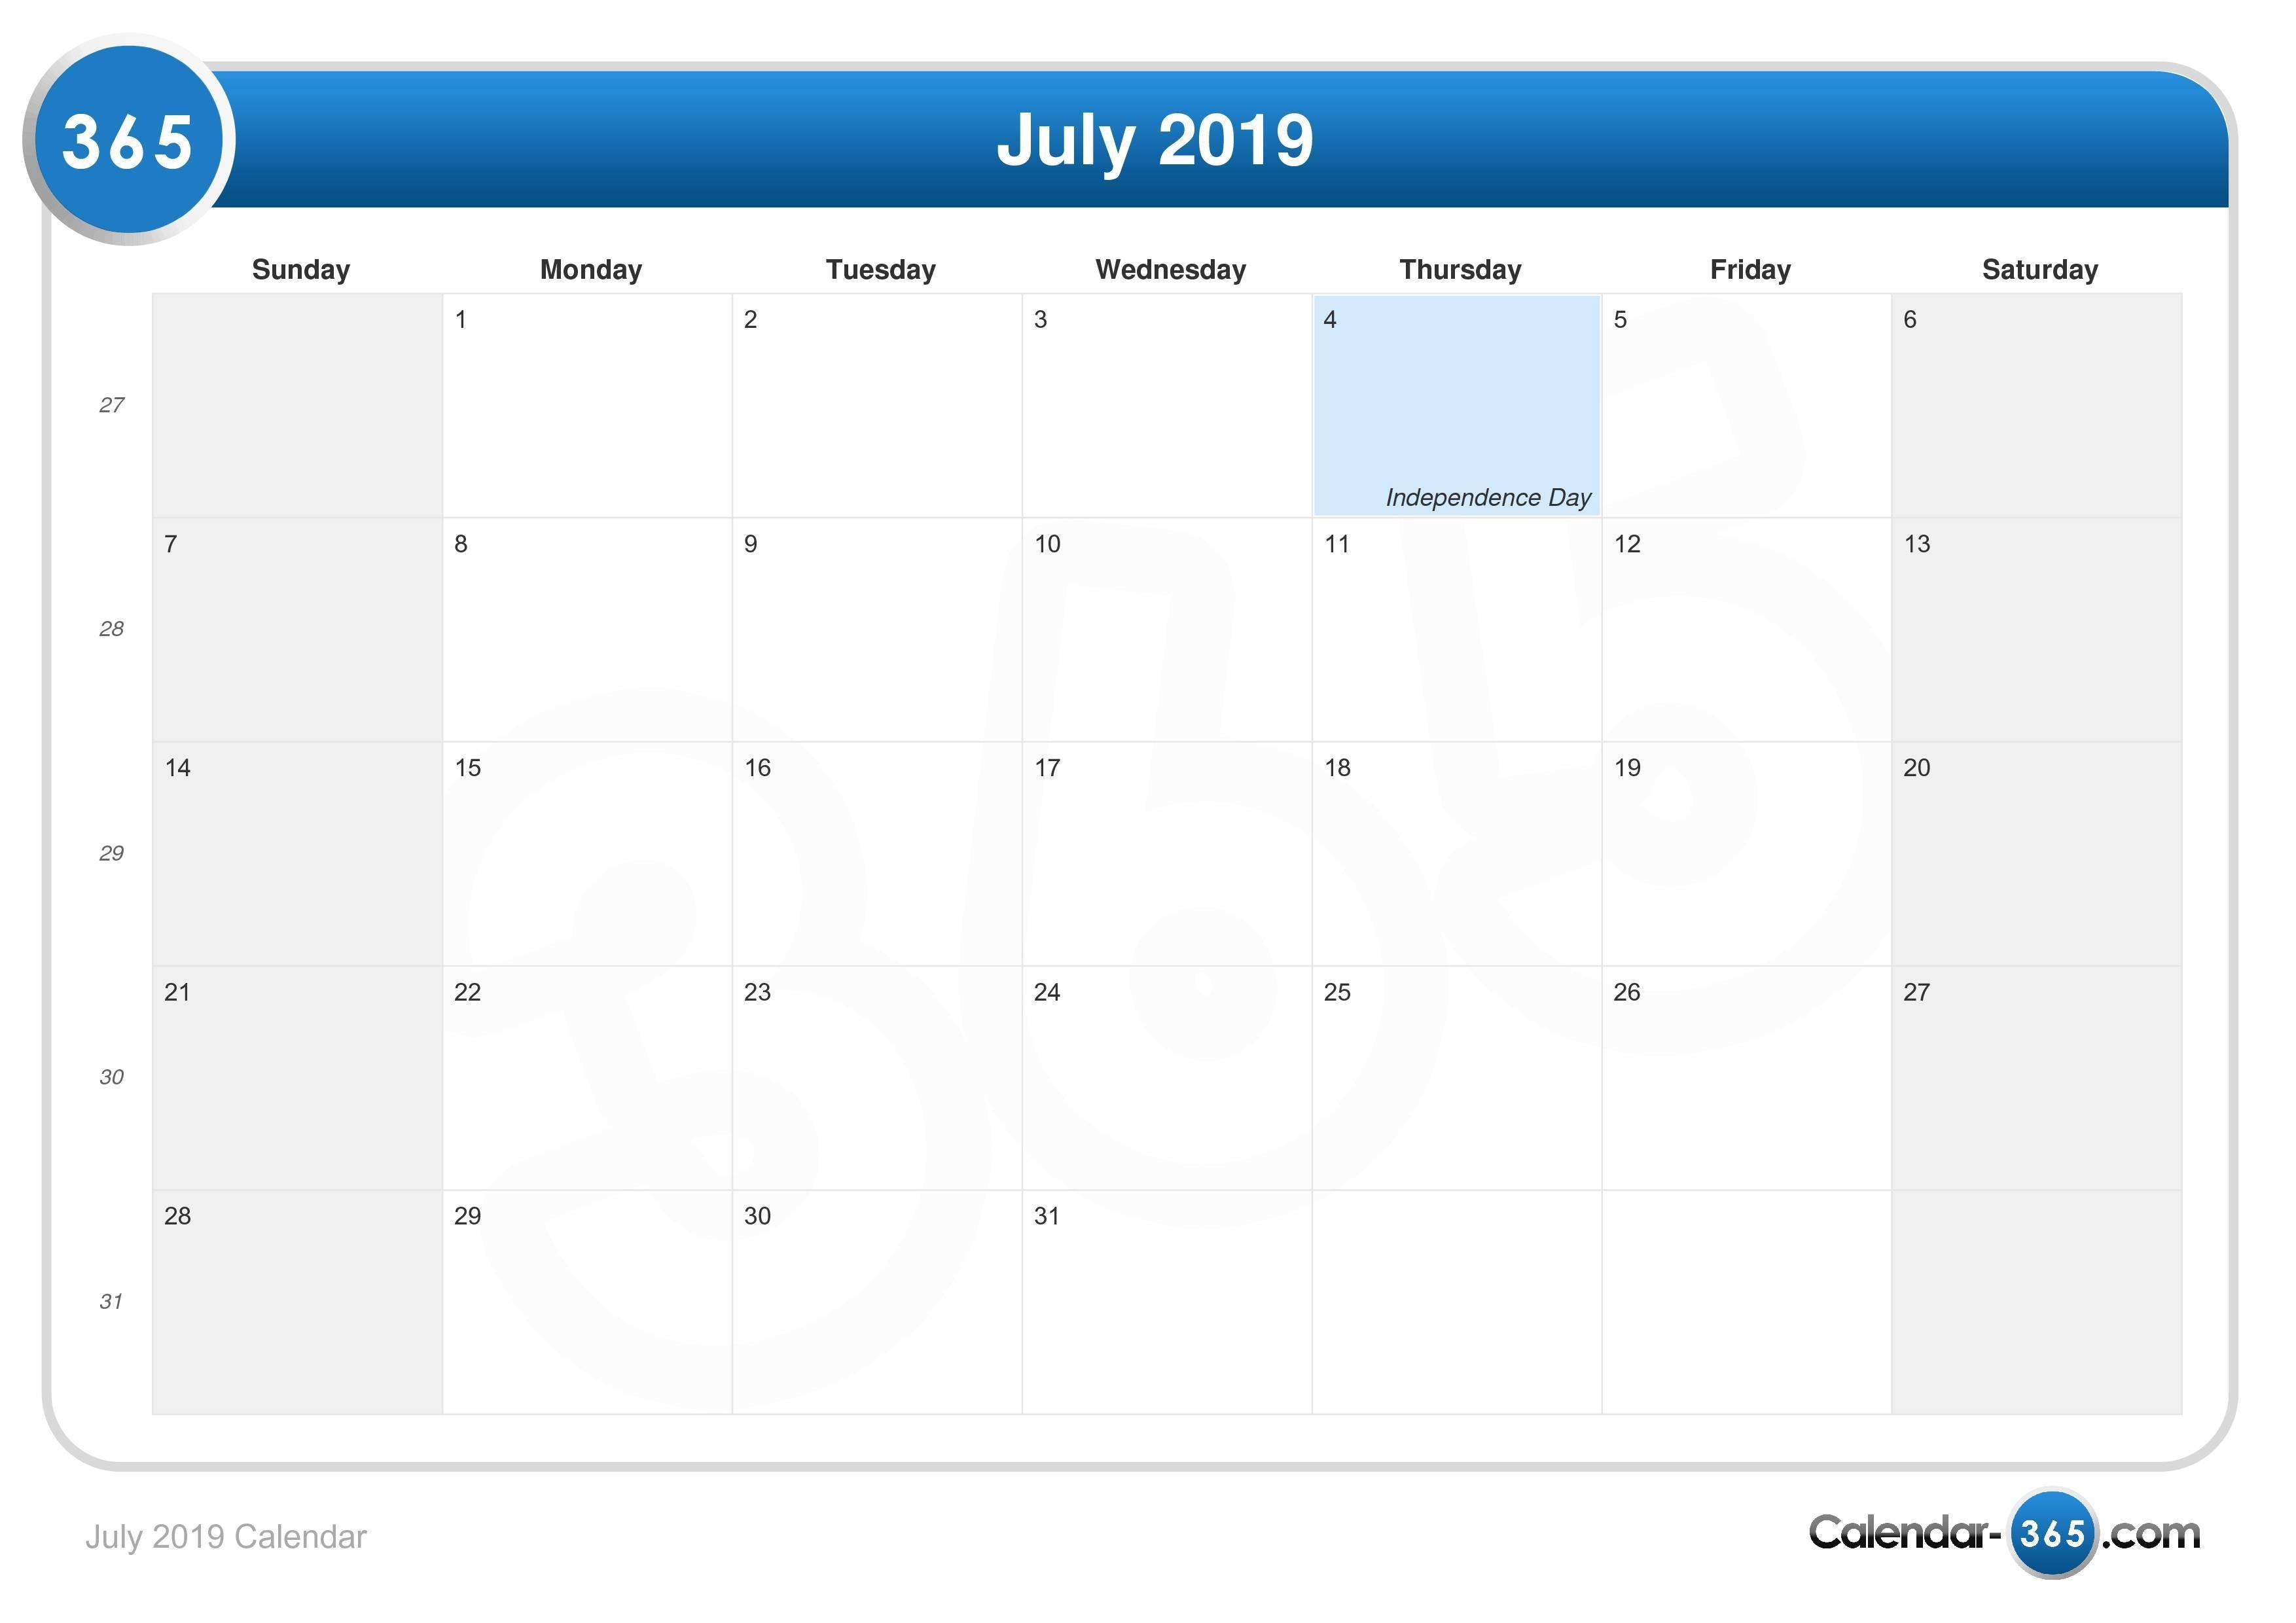 July 2019 Calendar Calendar July 4 2019